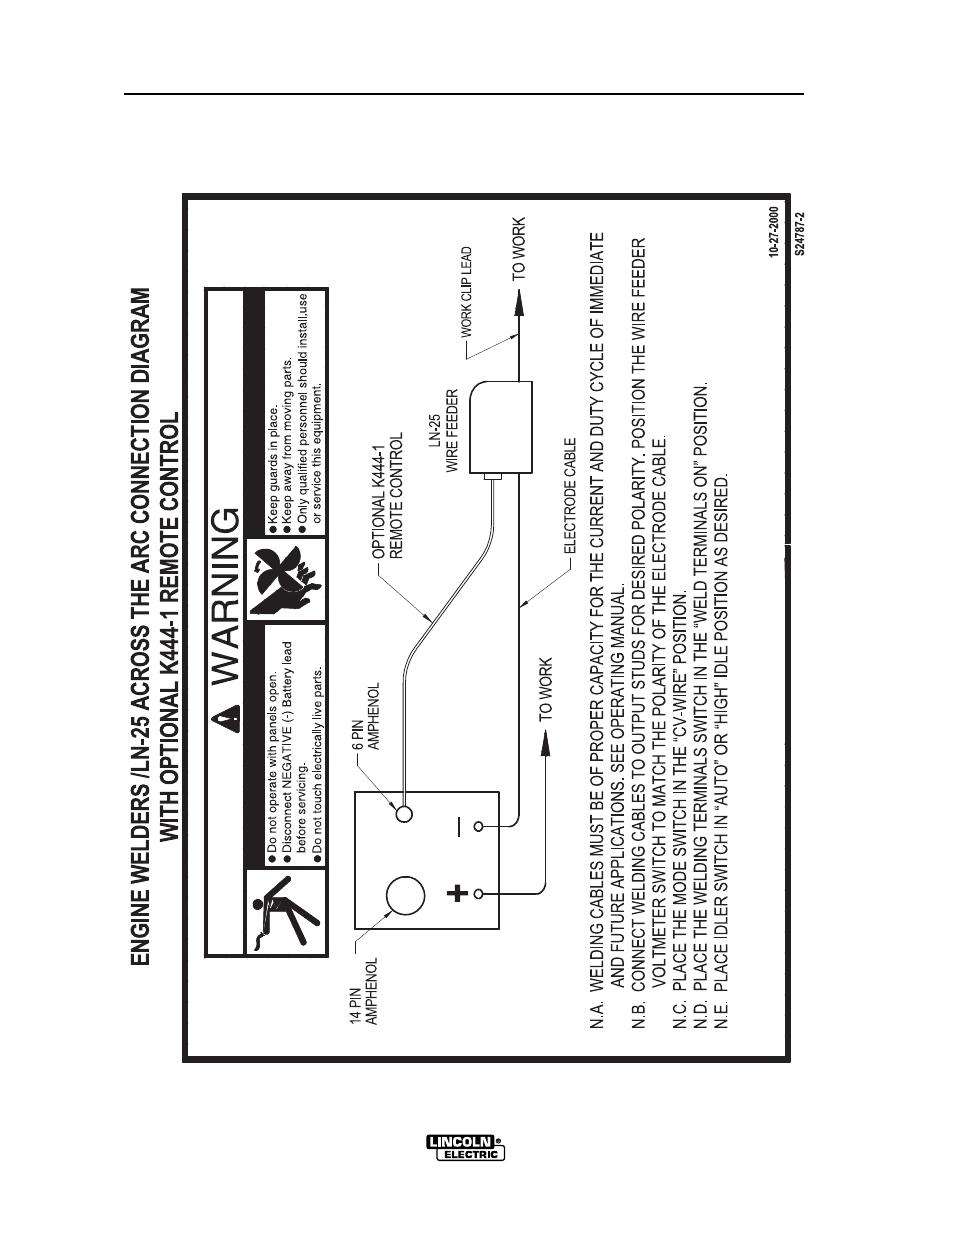 lincoln electric vantage 575 user manual page 46 54 rh manualsdir com 1999  Lincoln Navigator Engine Diagram 1965 Lincoln Wiring Diagrams Automotive